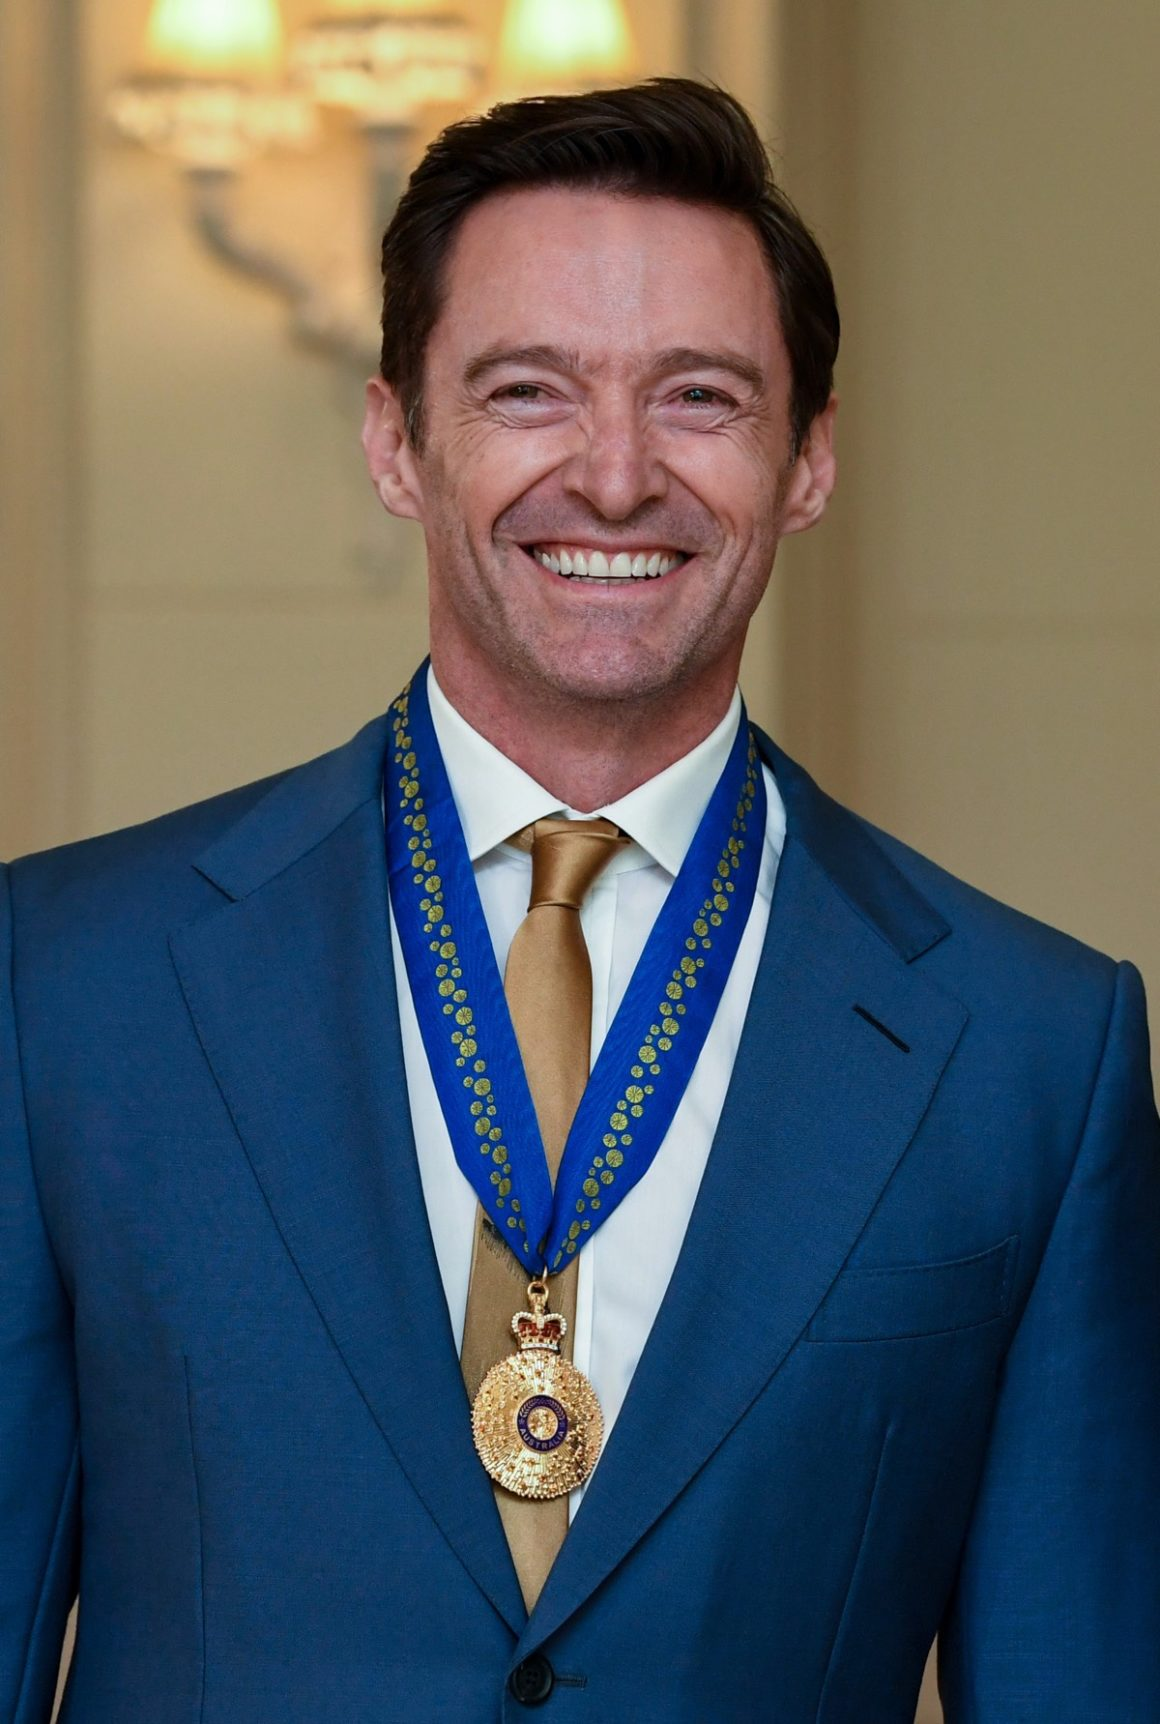 Hugh Jackman Awarded Order Of Australia